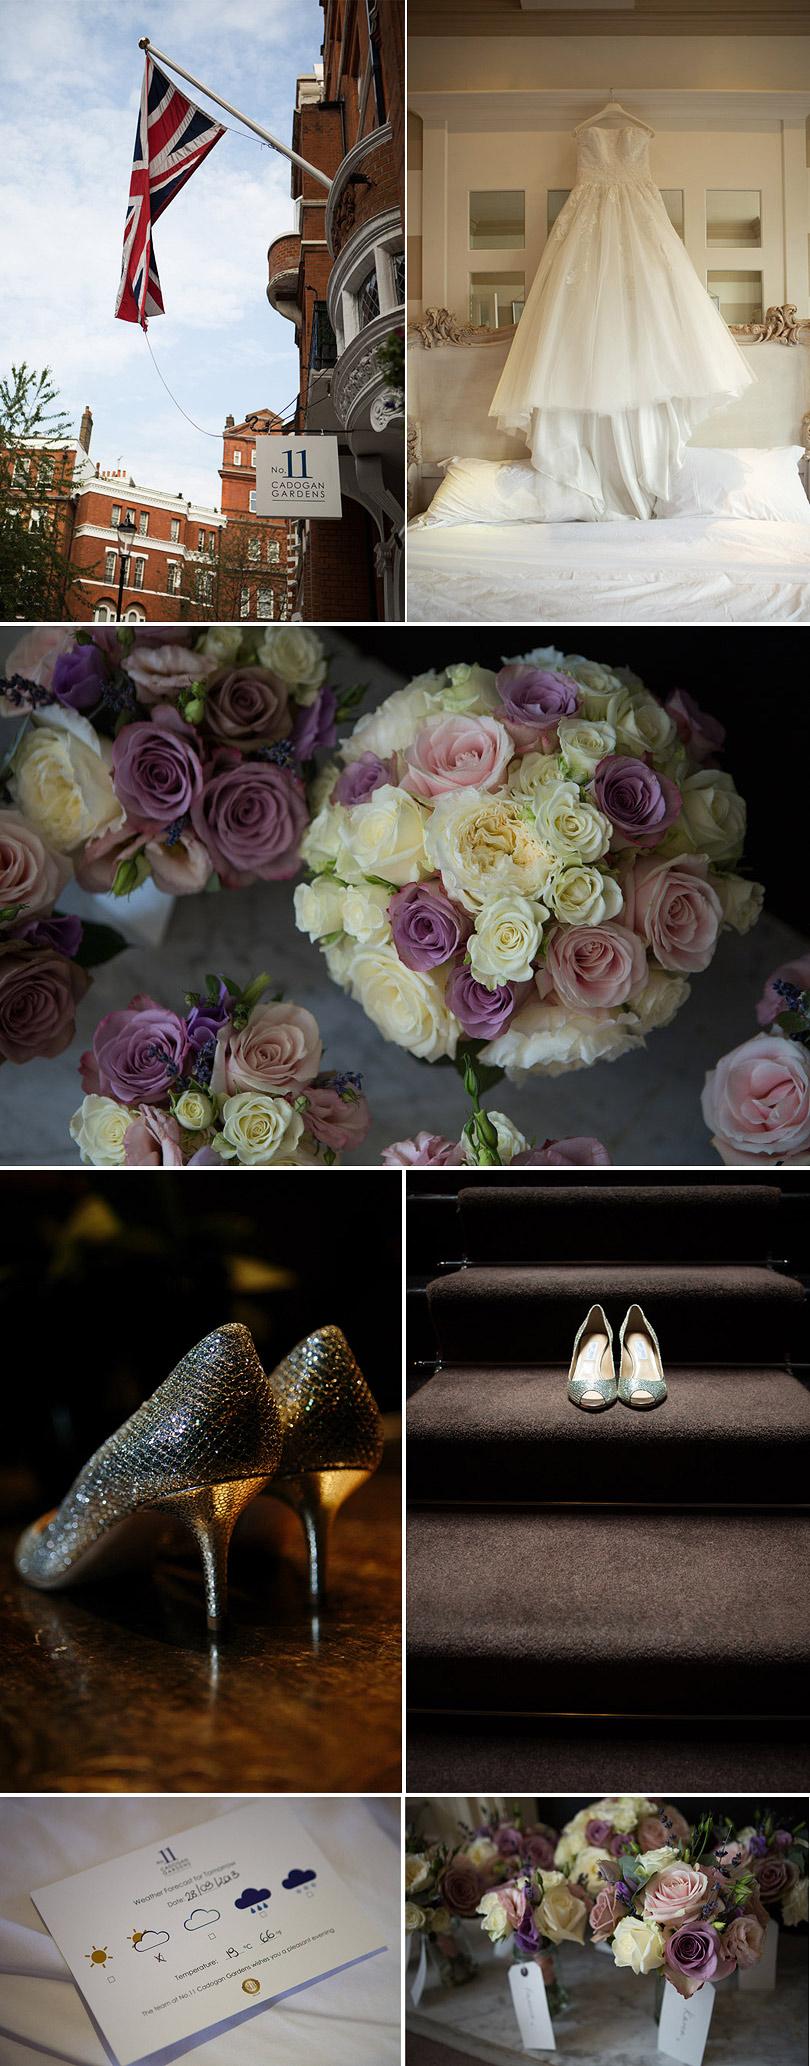 Brompton-Oratory-Lincolns-Inn-Wedding-RachelMax-002.jpg